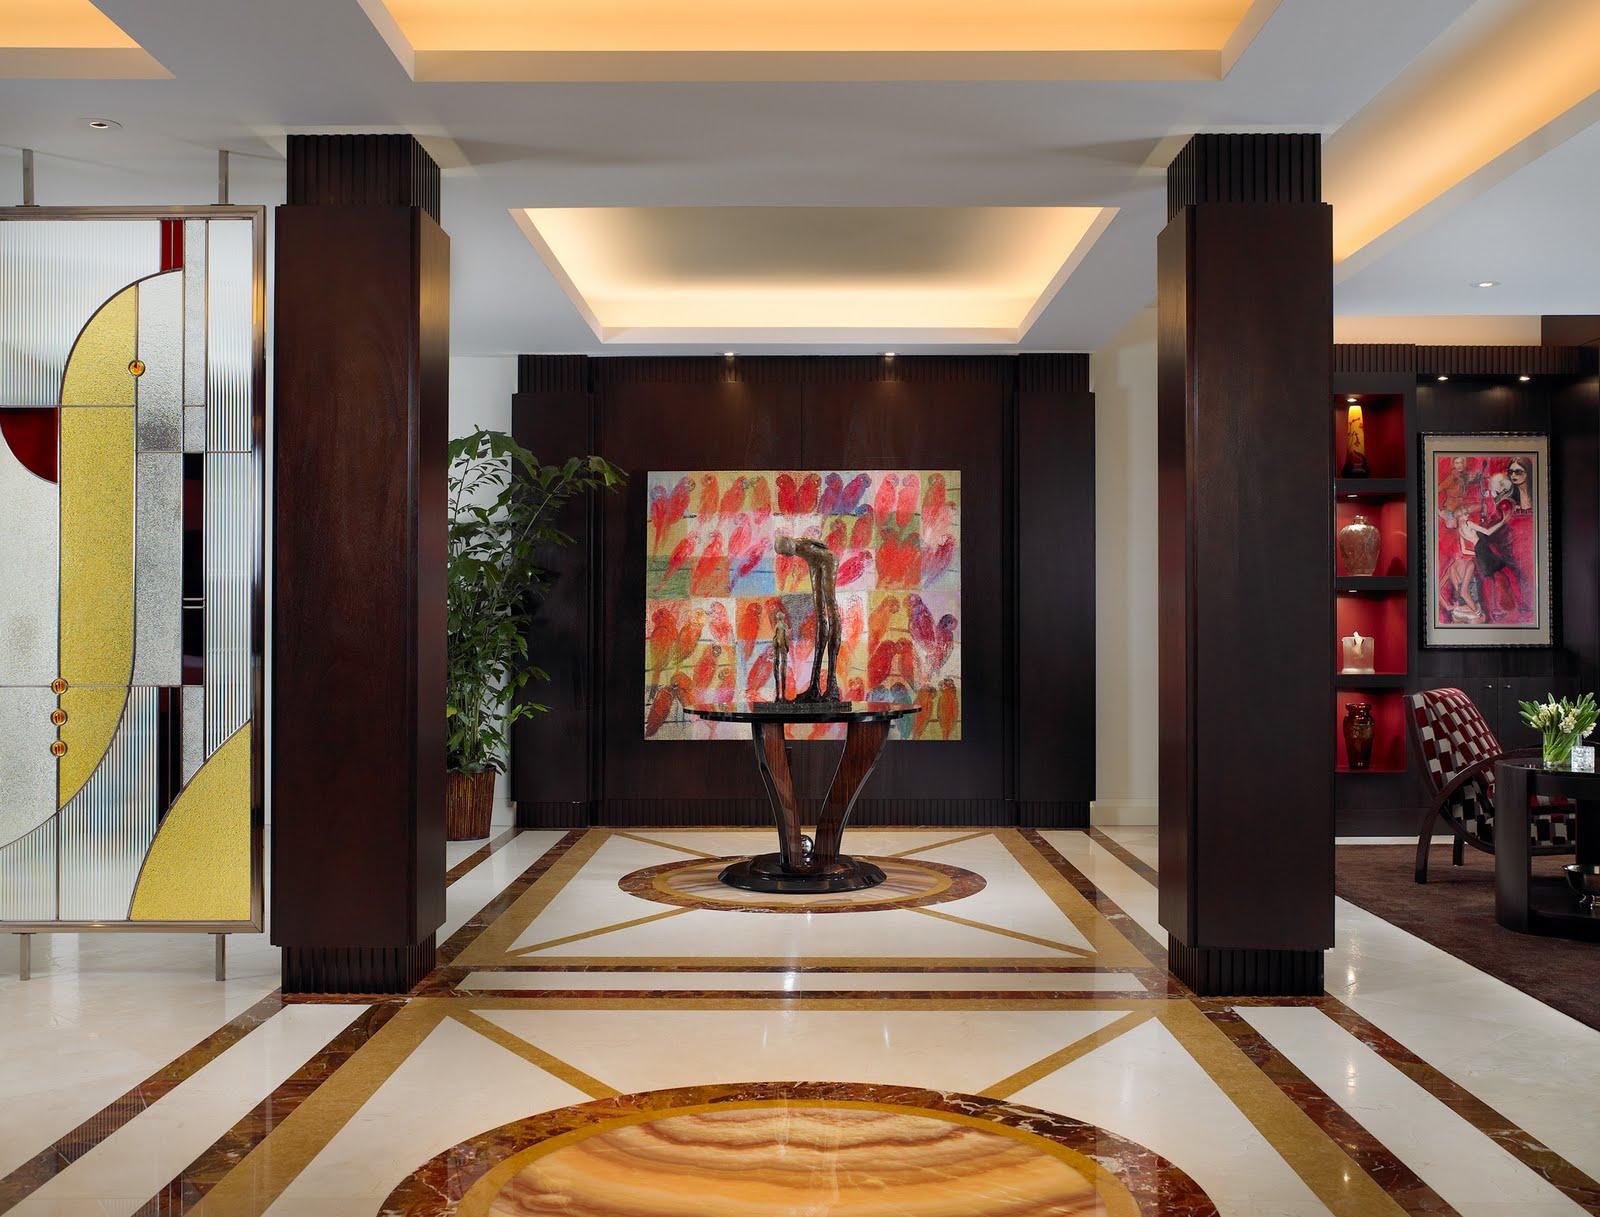 Issues on interior design alene workman interior design